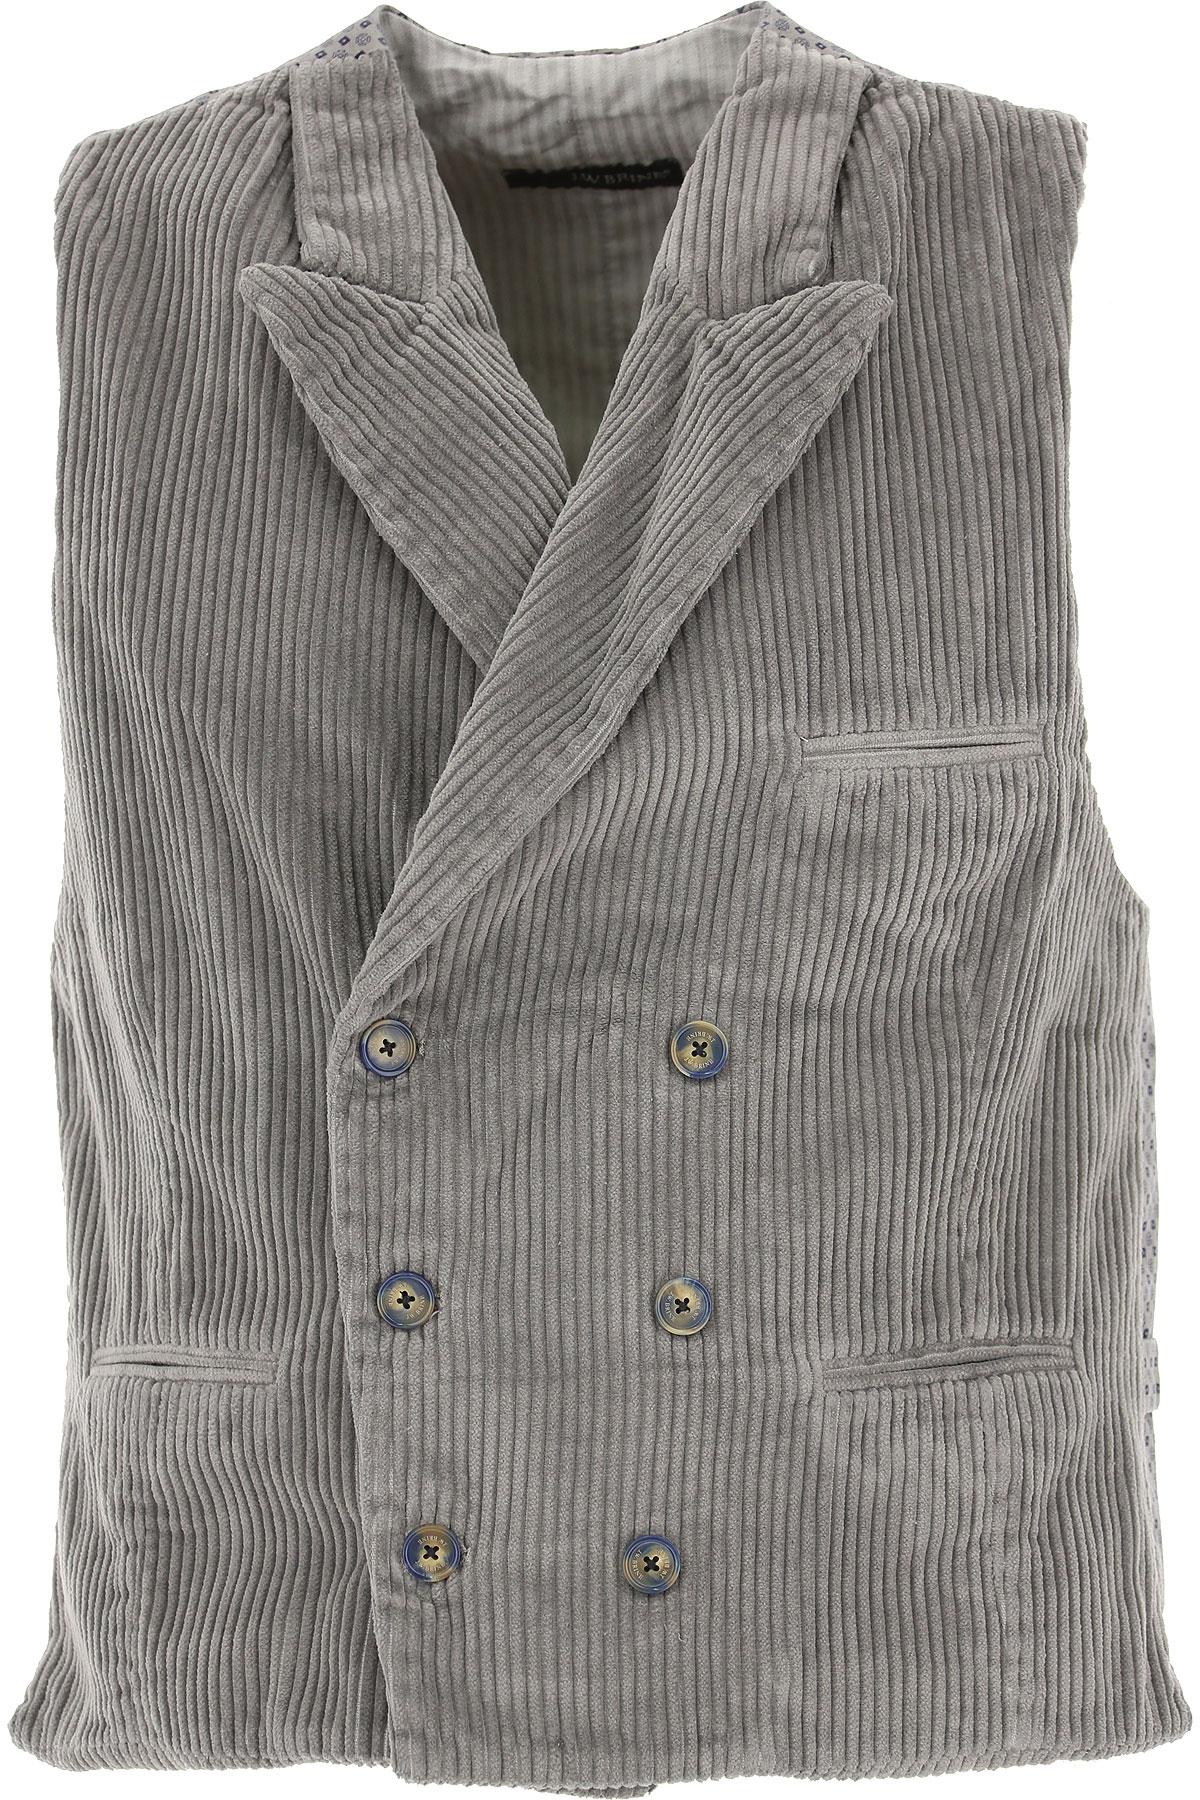 905edb0920b7 J.W. Brine Ανδρικά Ρούχα Σε Έκπτωση